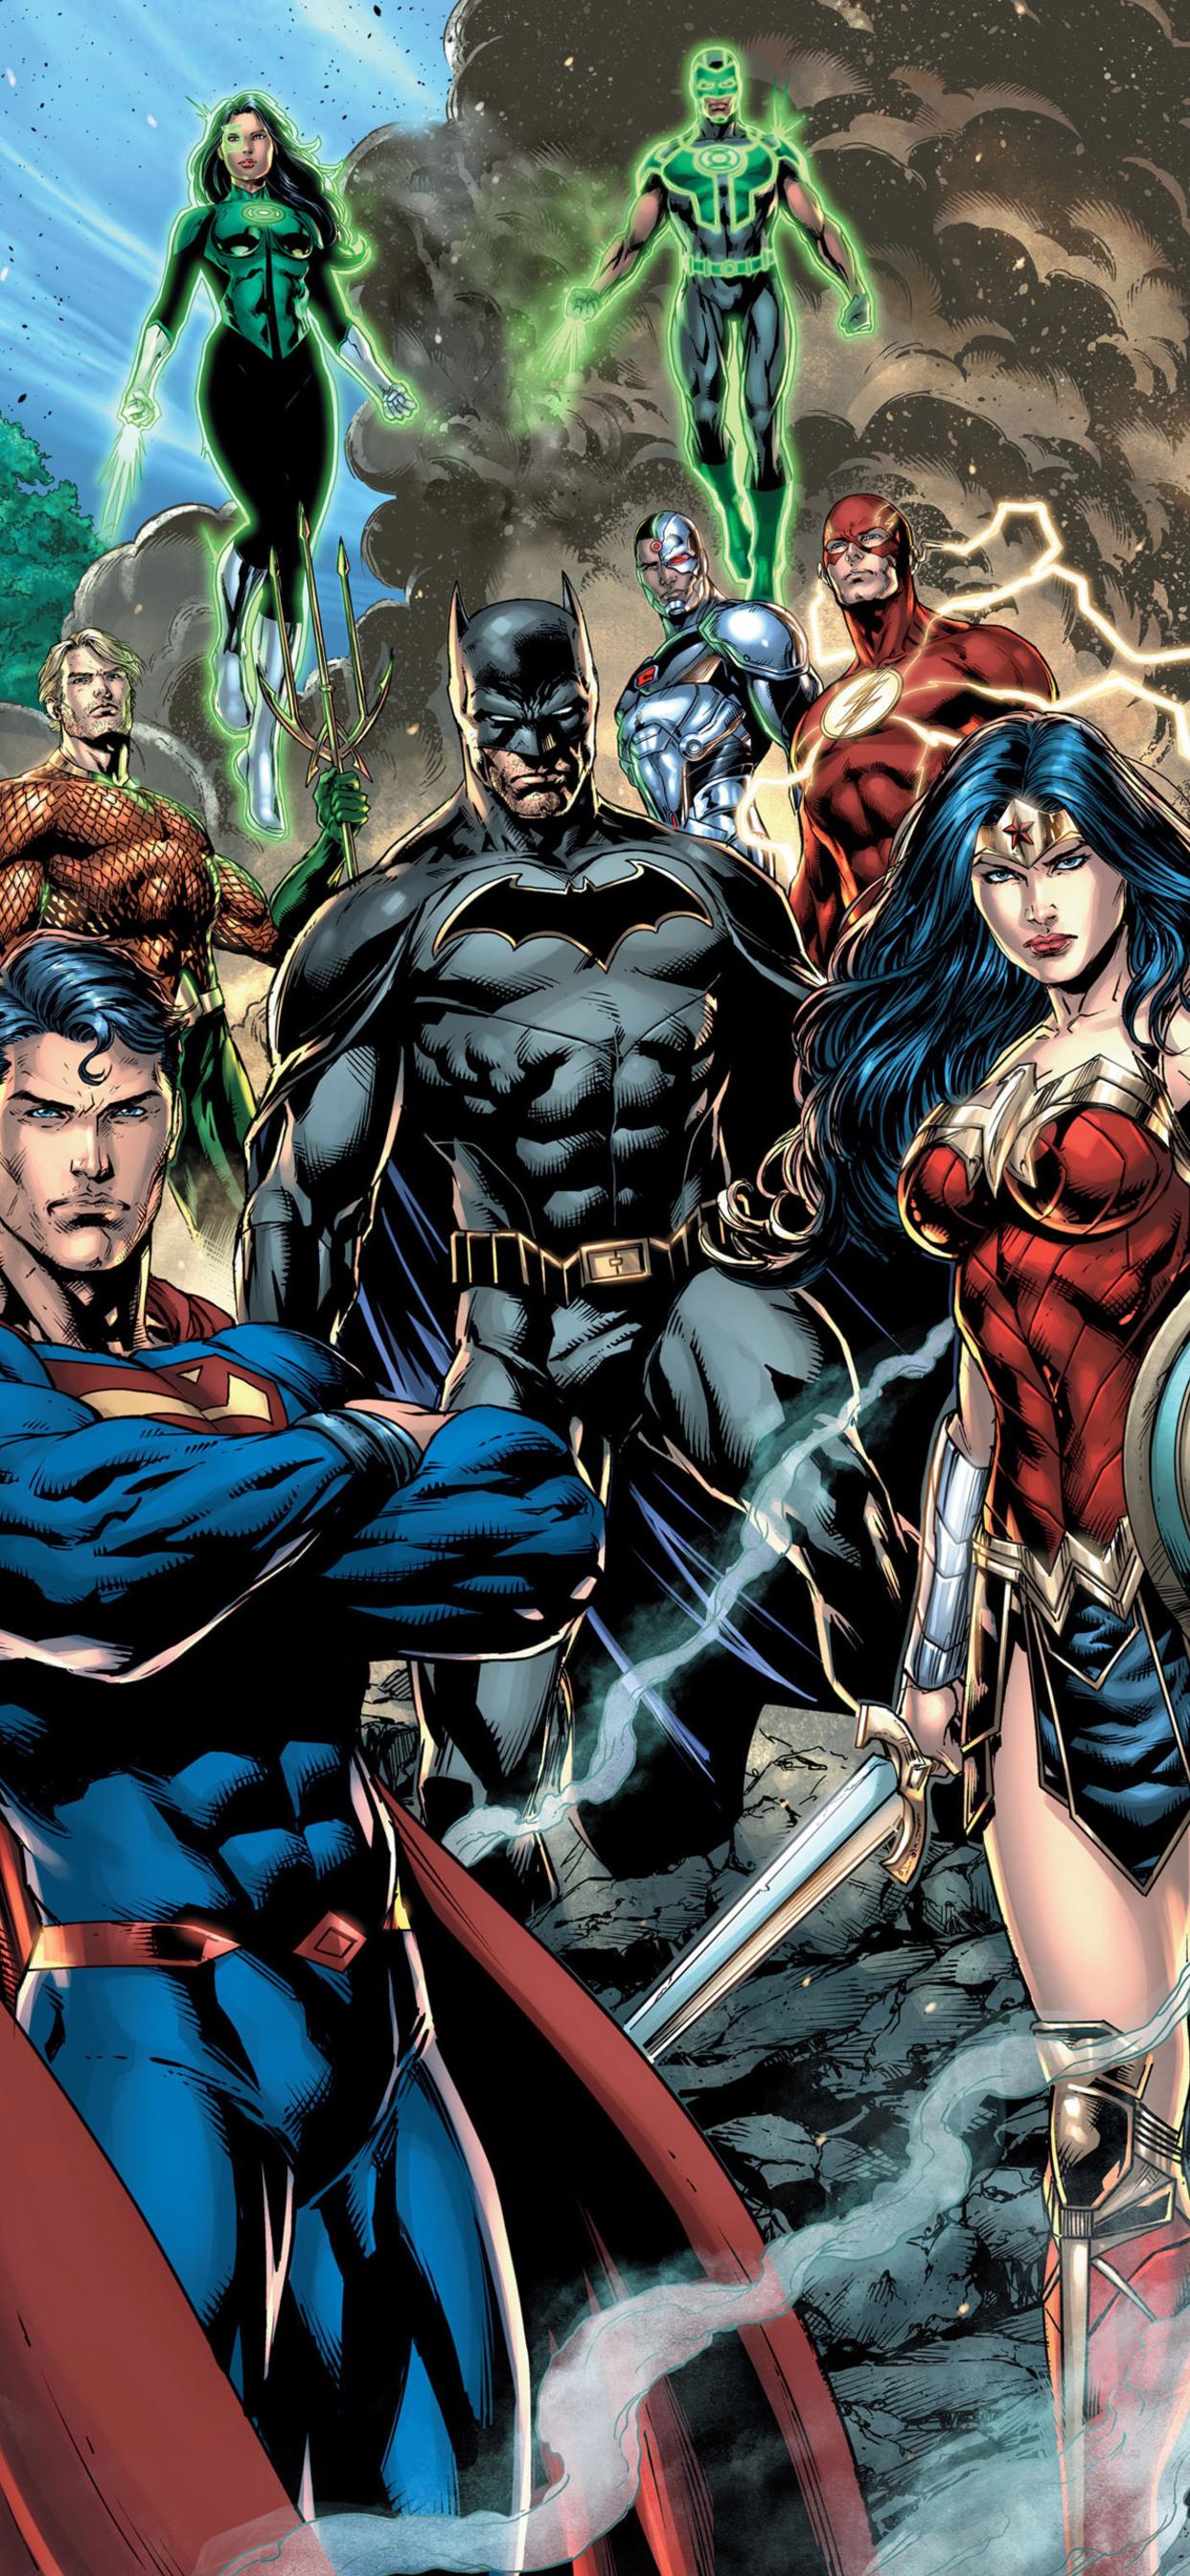 Justice League Dc Comic Art (Iphone XS MAX)